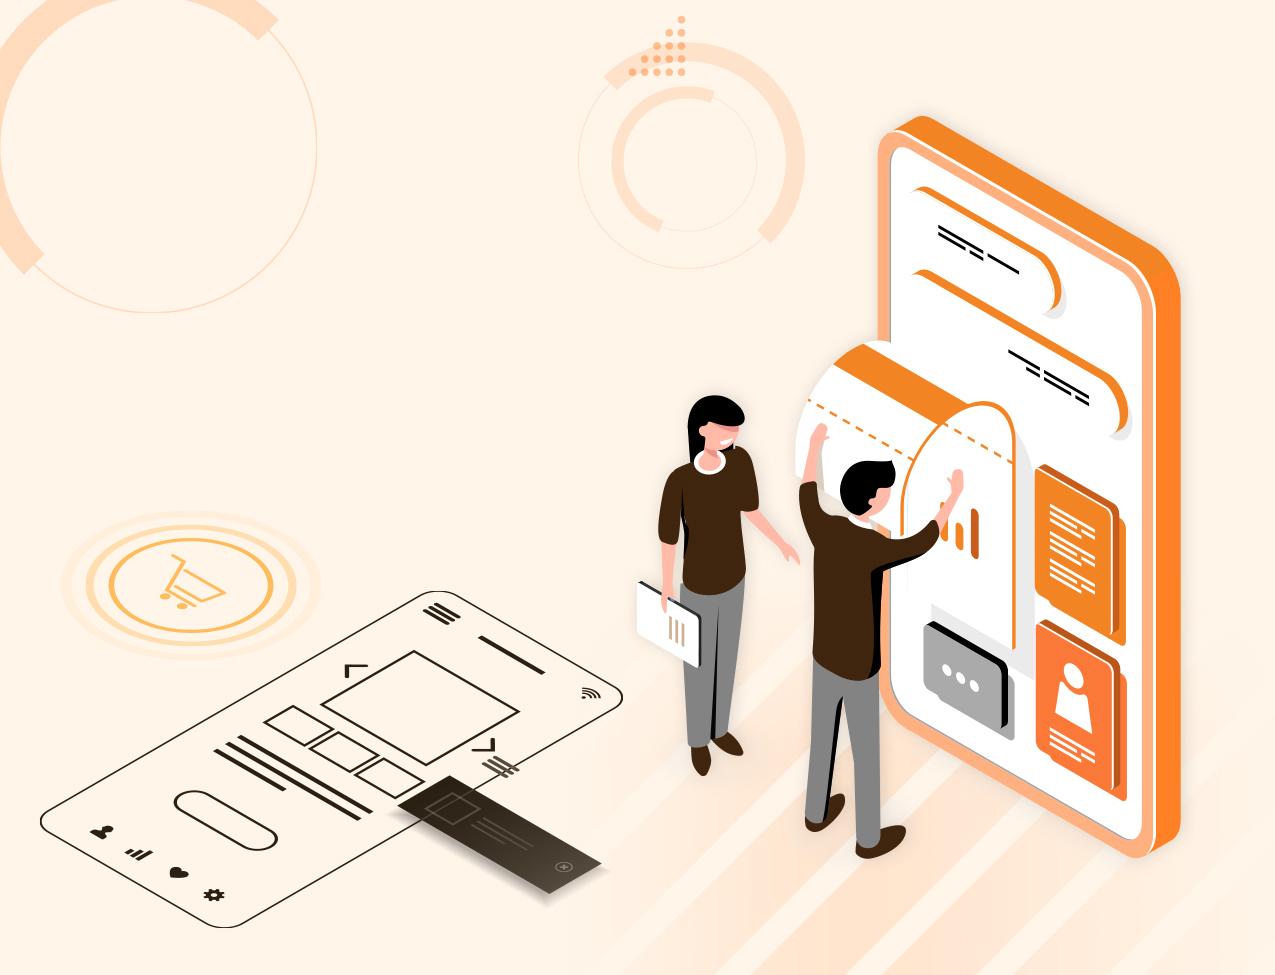 Major Benefits of UX and UI Design in Mobile App Development